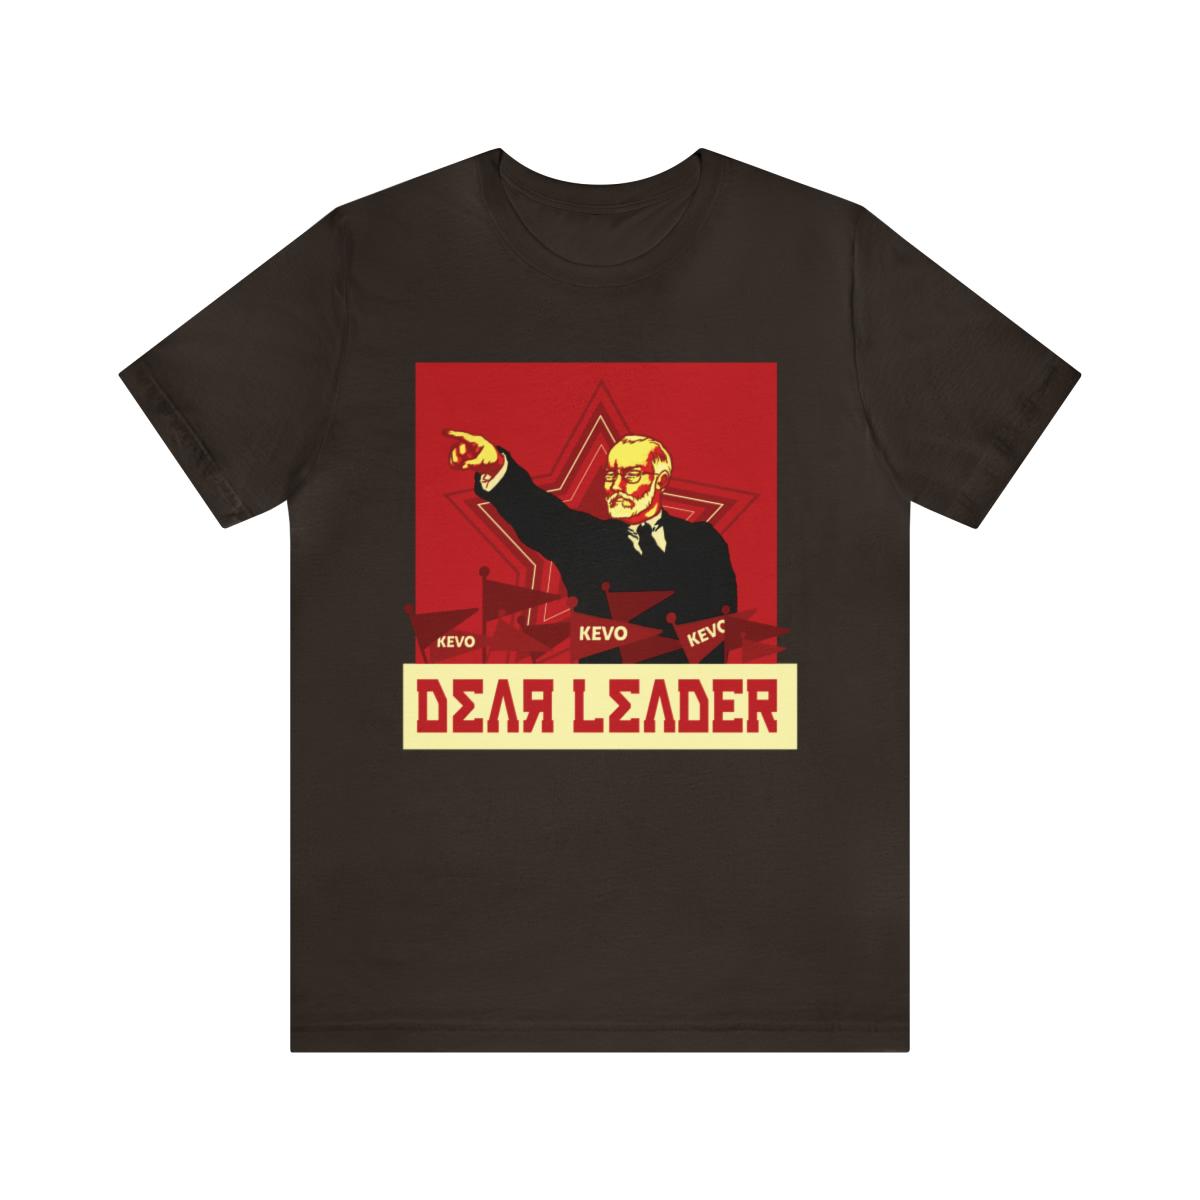 Dear Leader T-Shirt